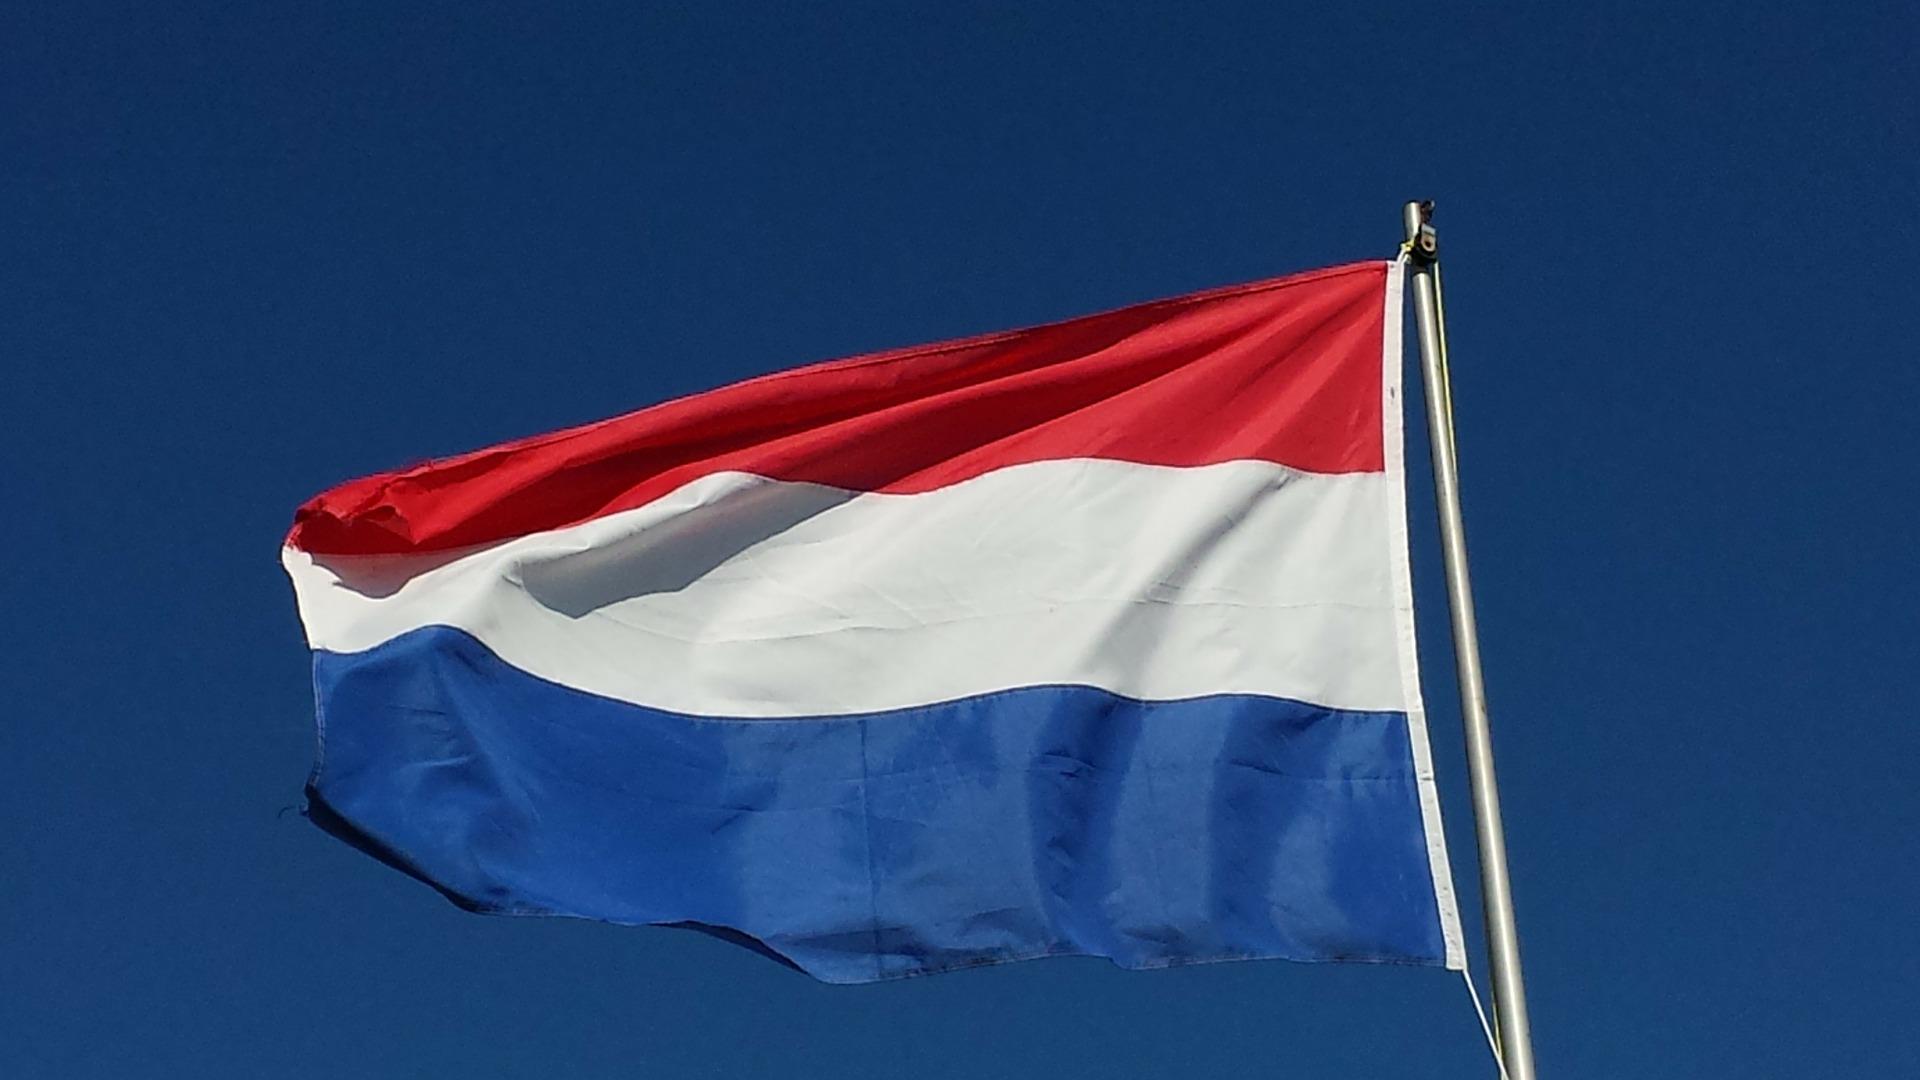 Nederlandse vlag mag wapperen op Veteranendag vlag september